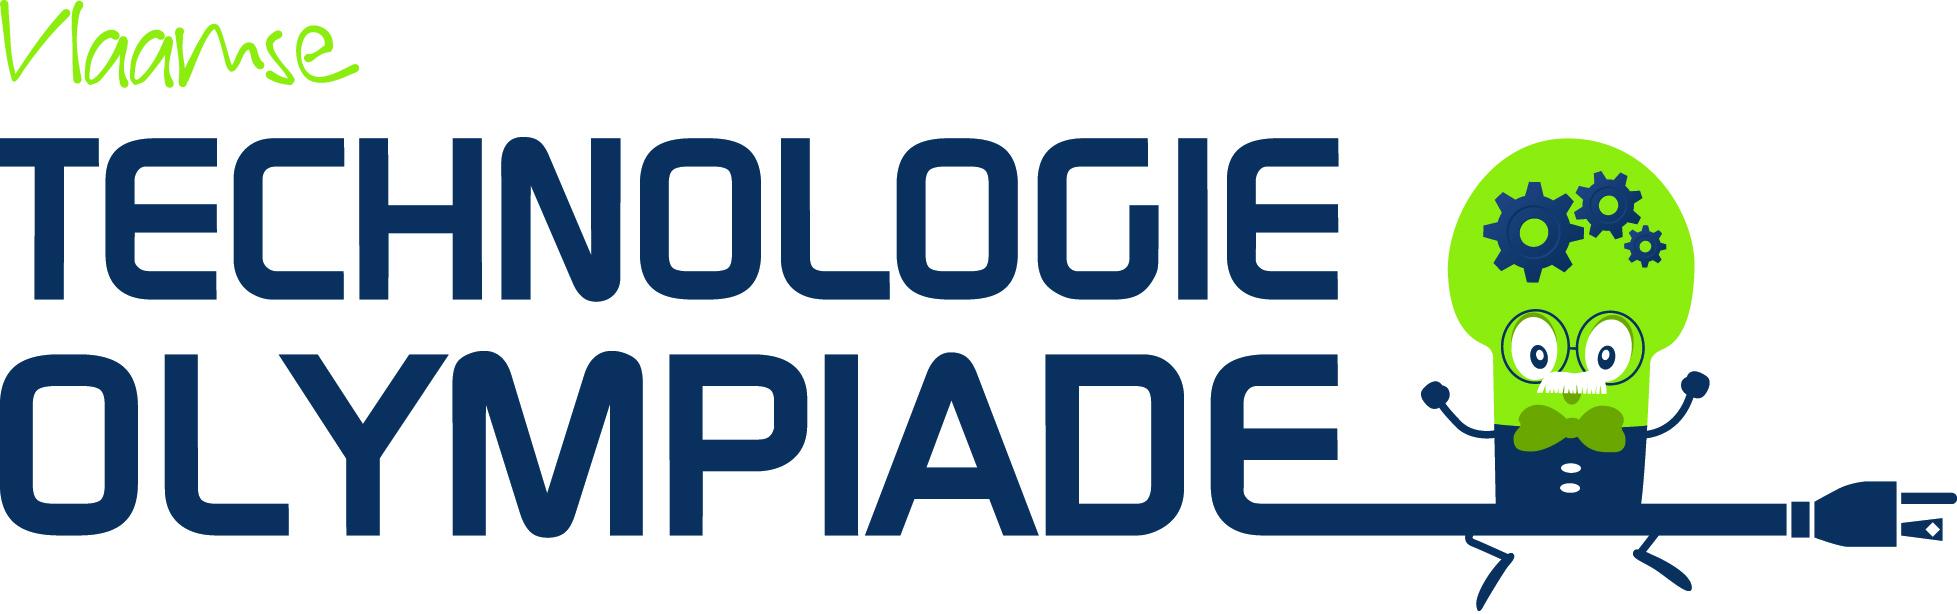 Vlaamse Jeugd Technologie Olympiade